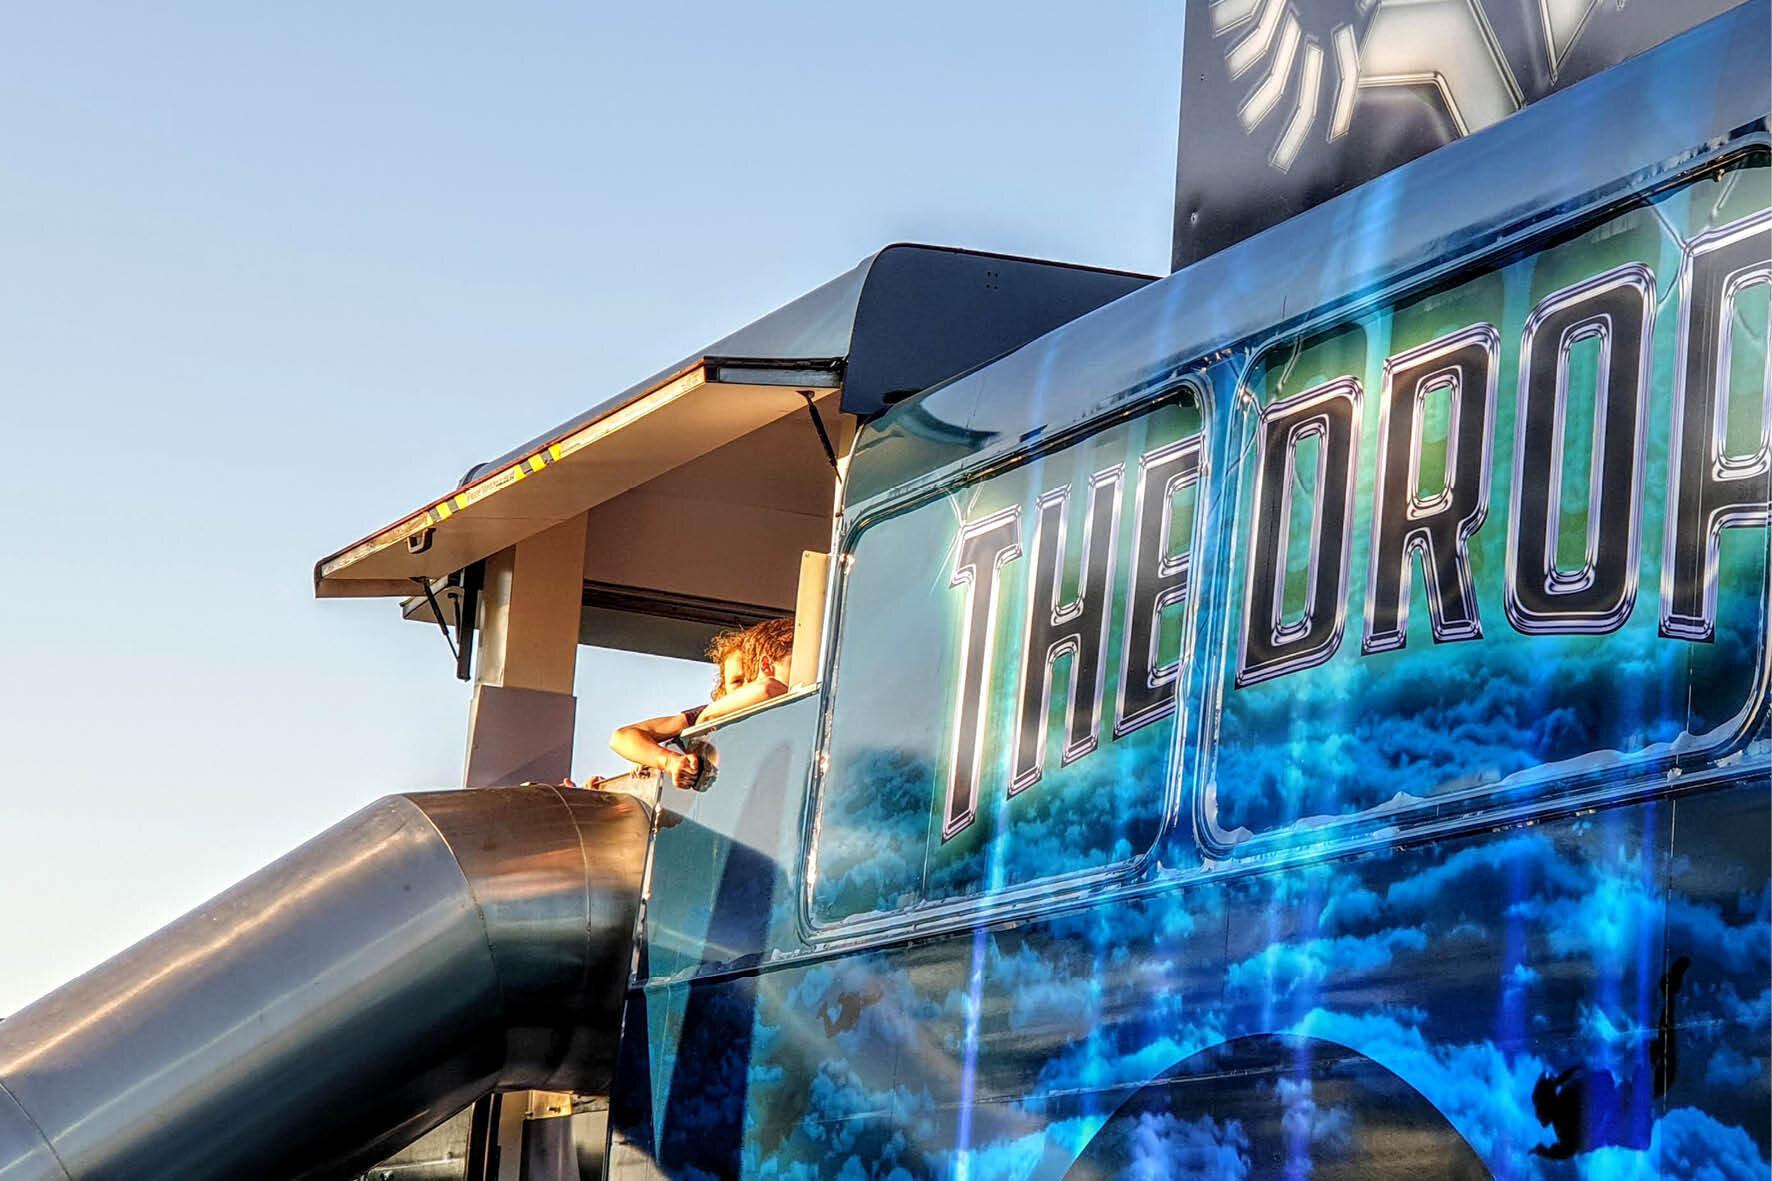 bus_business_the_drop_harrogate_14.jpg